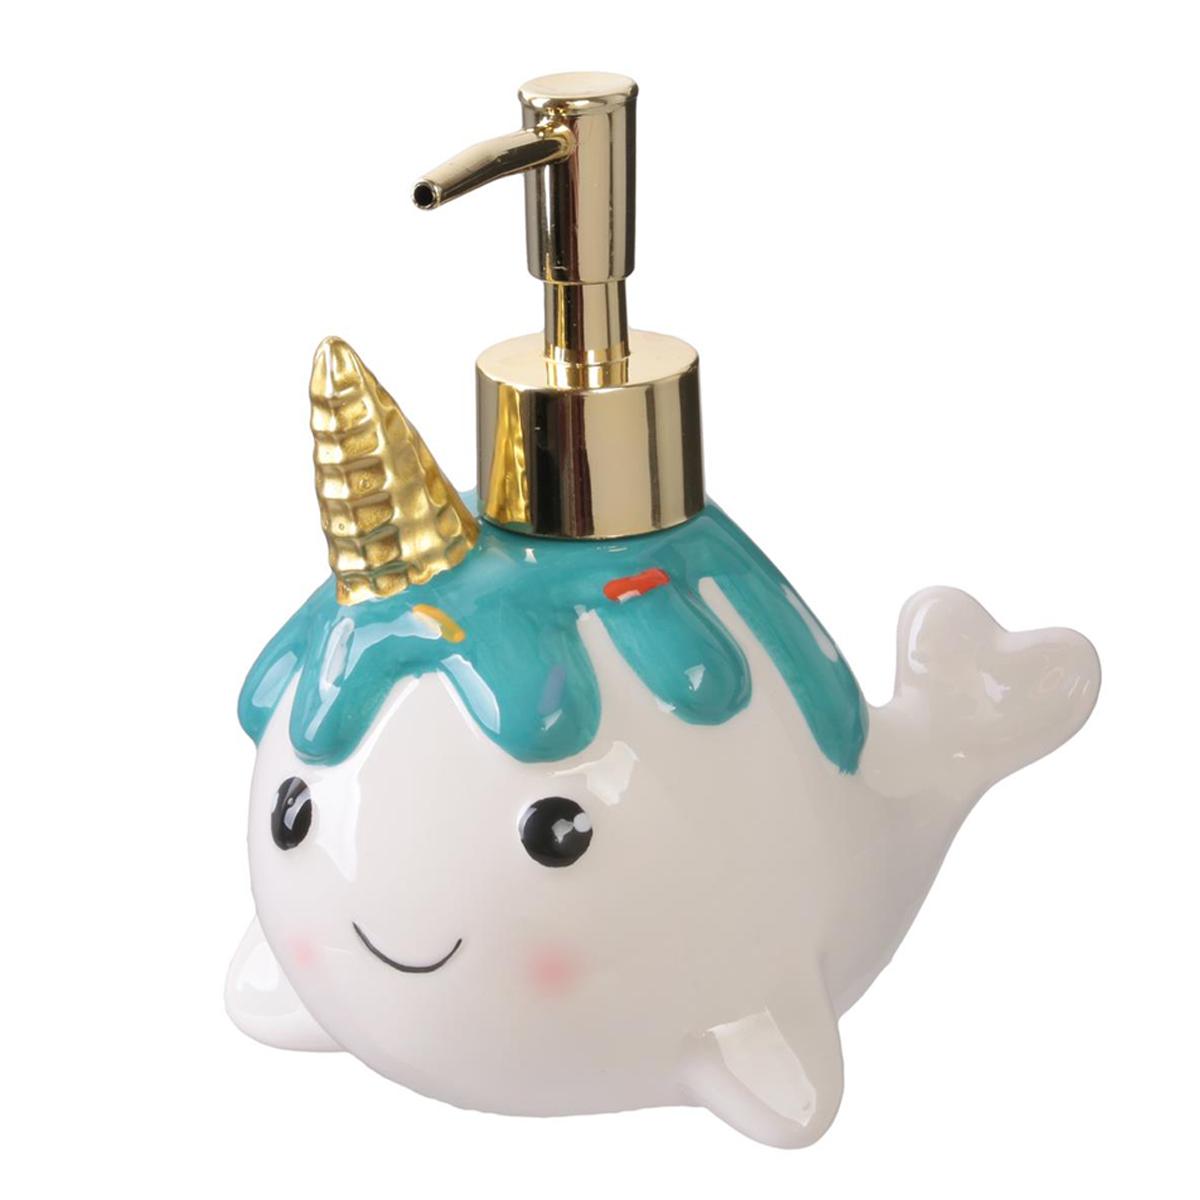 Distributeur de savon céramique \'Licorne My Unicorn\' blanc vert (balein unicorn) - 15x13 cm - [Q7753]